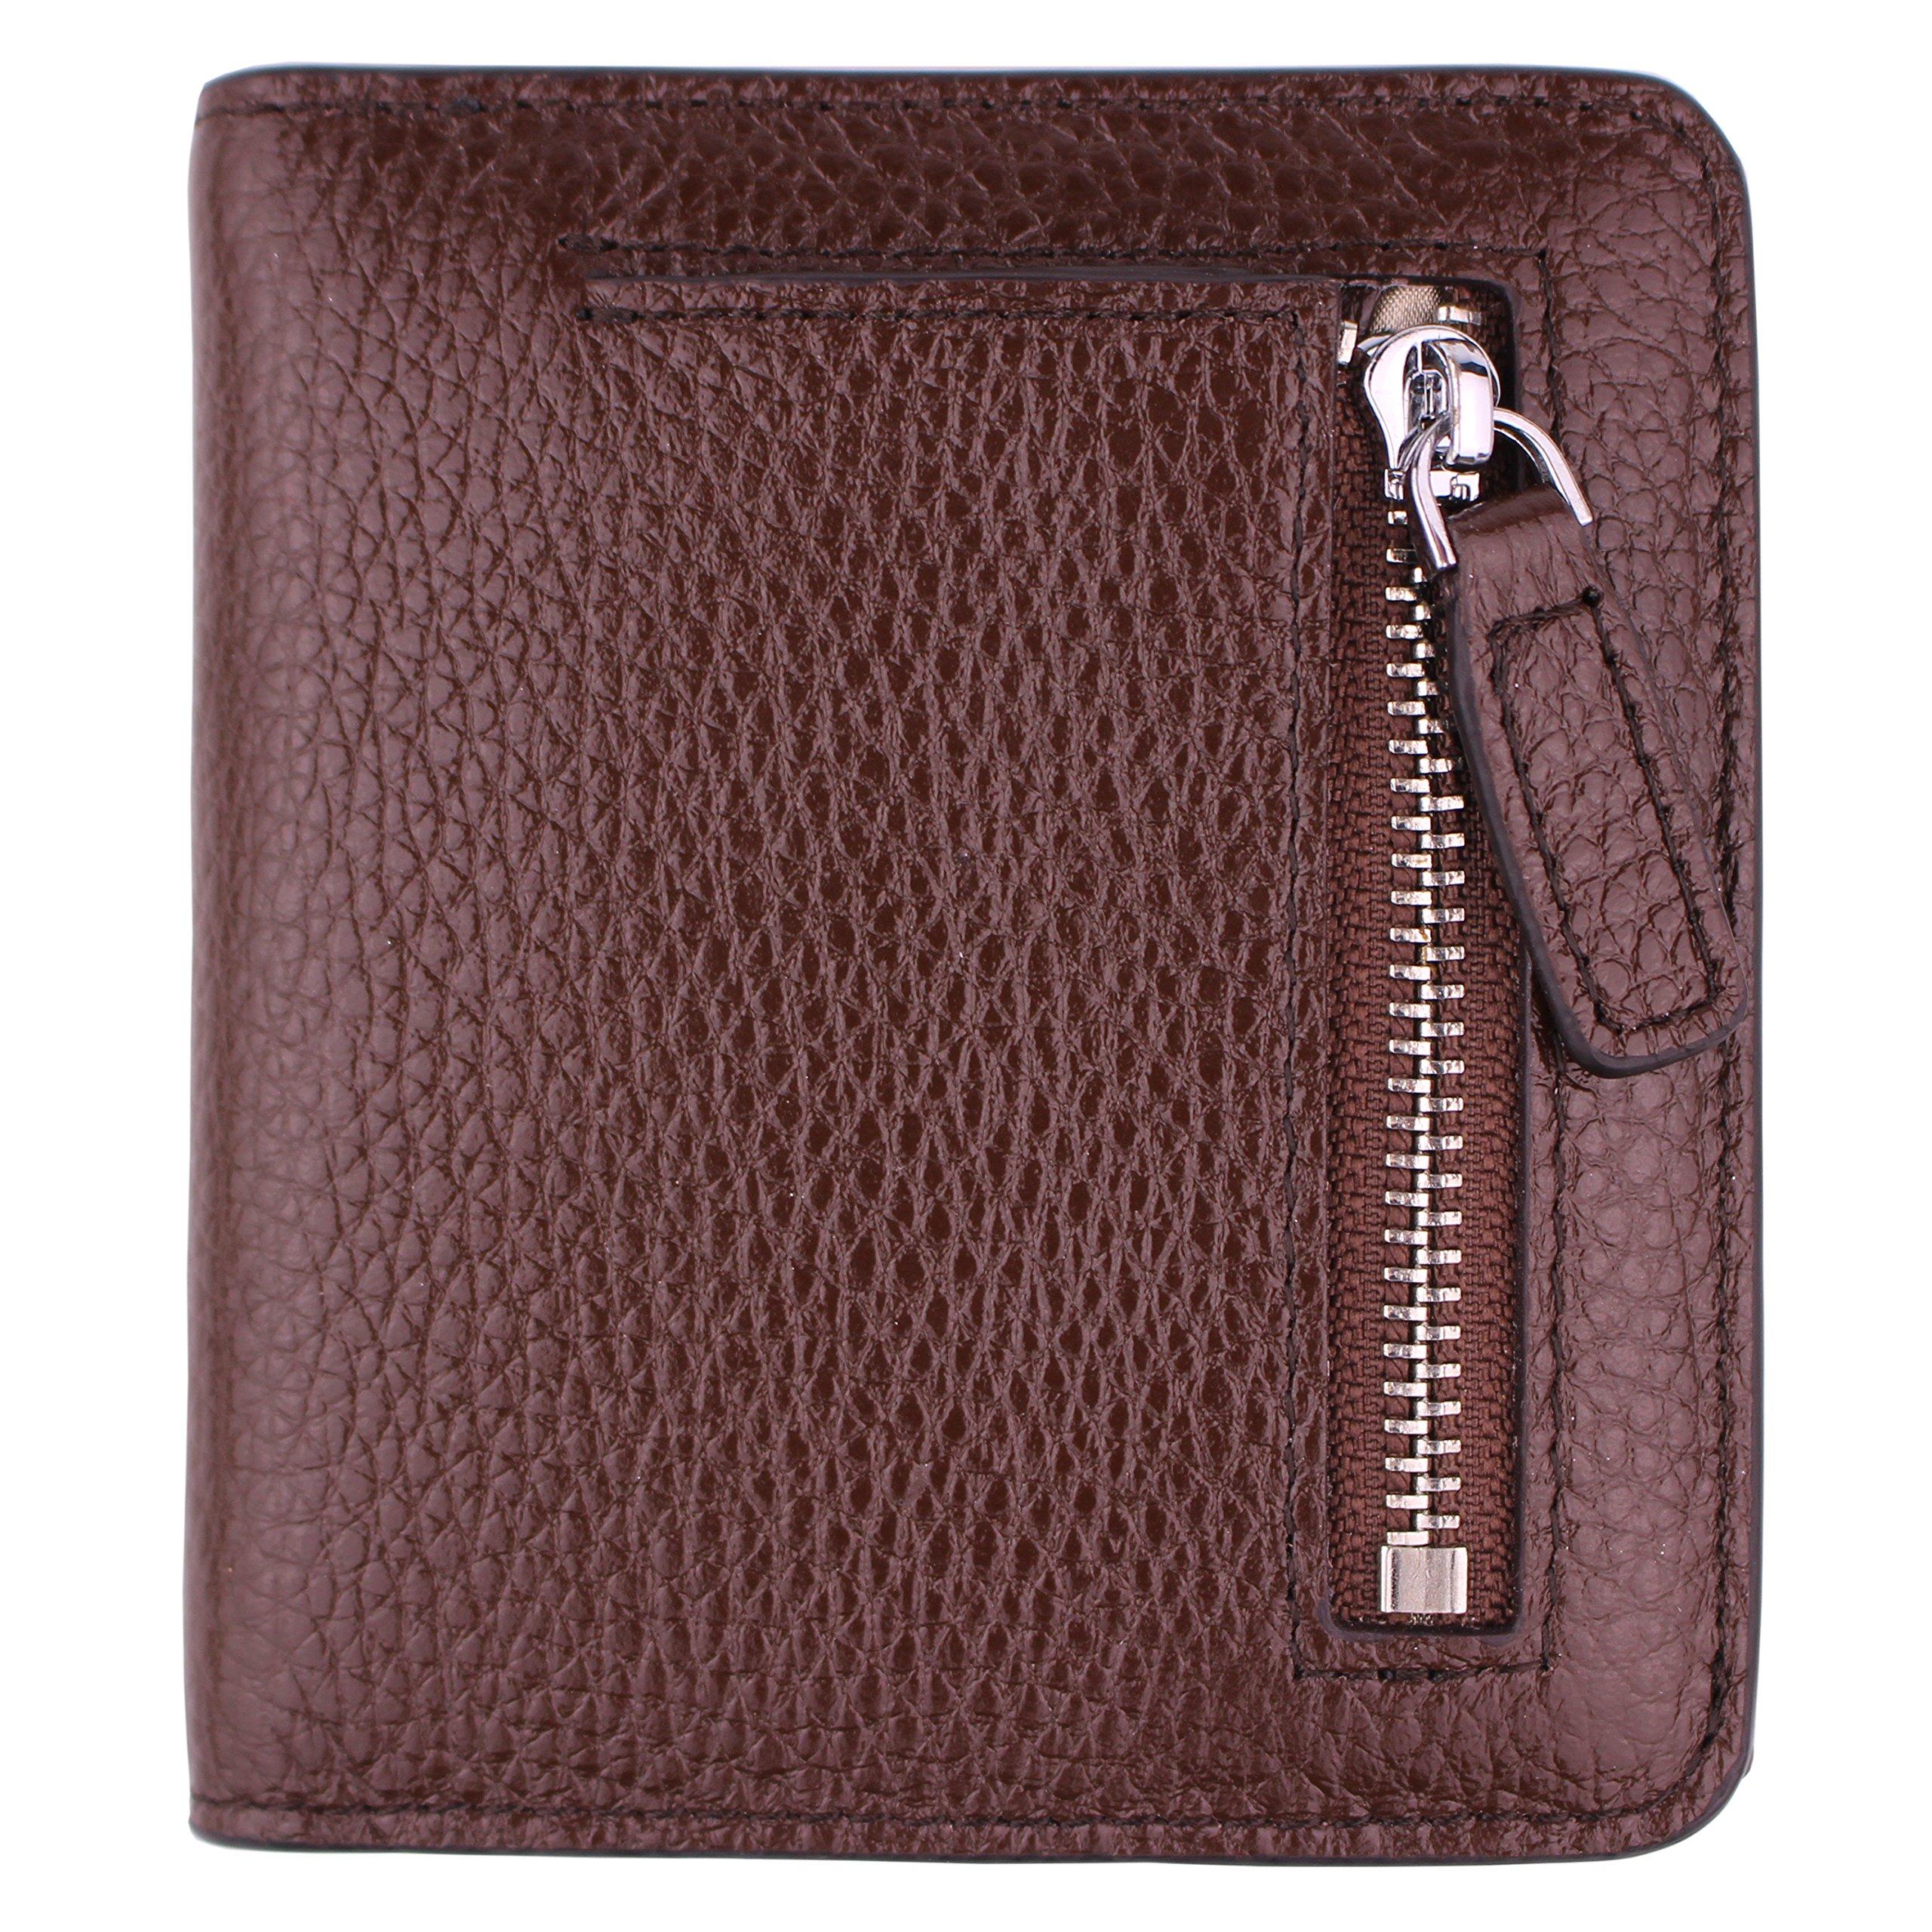 Women's RFID Blocking Small Genuine Leather Wallet Ladies Mini Card Case Purse (Coffee)